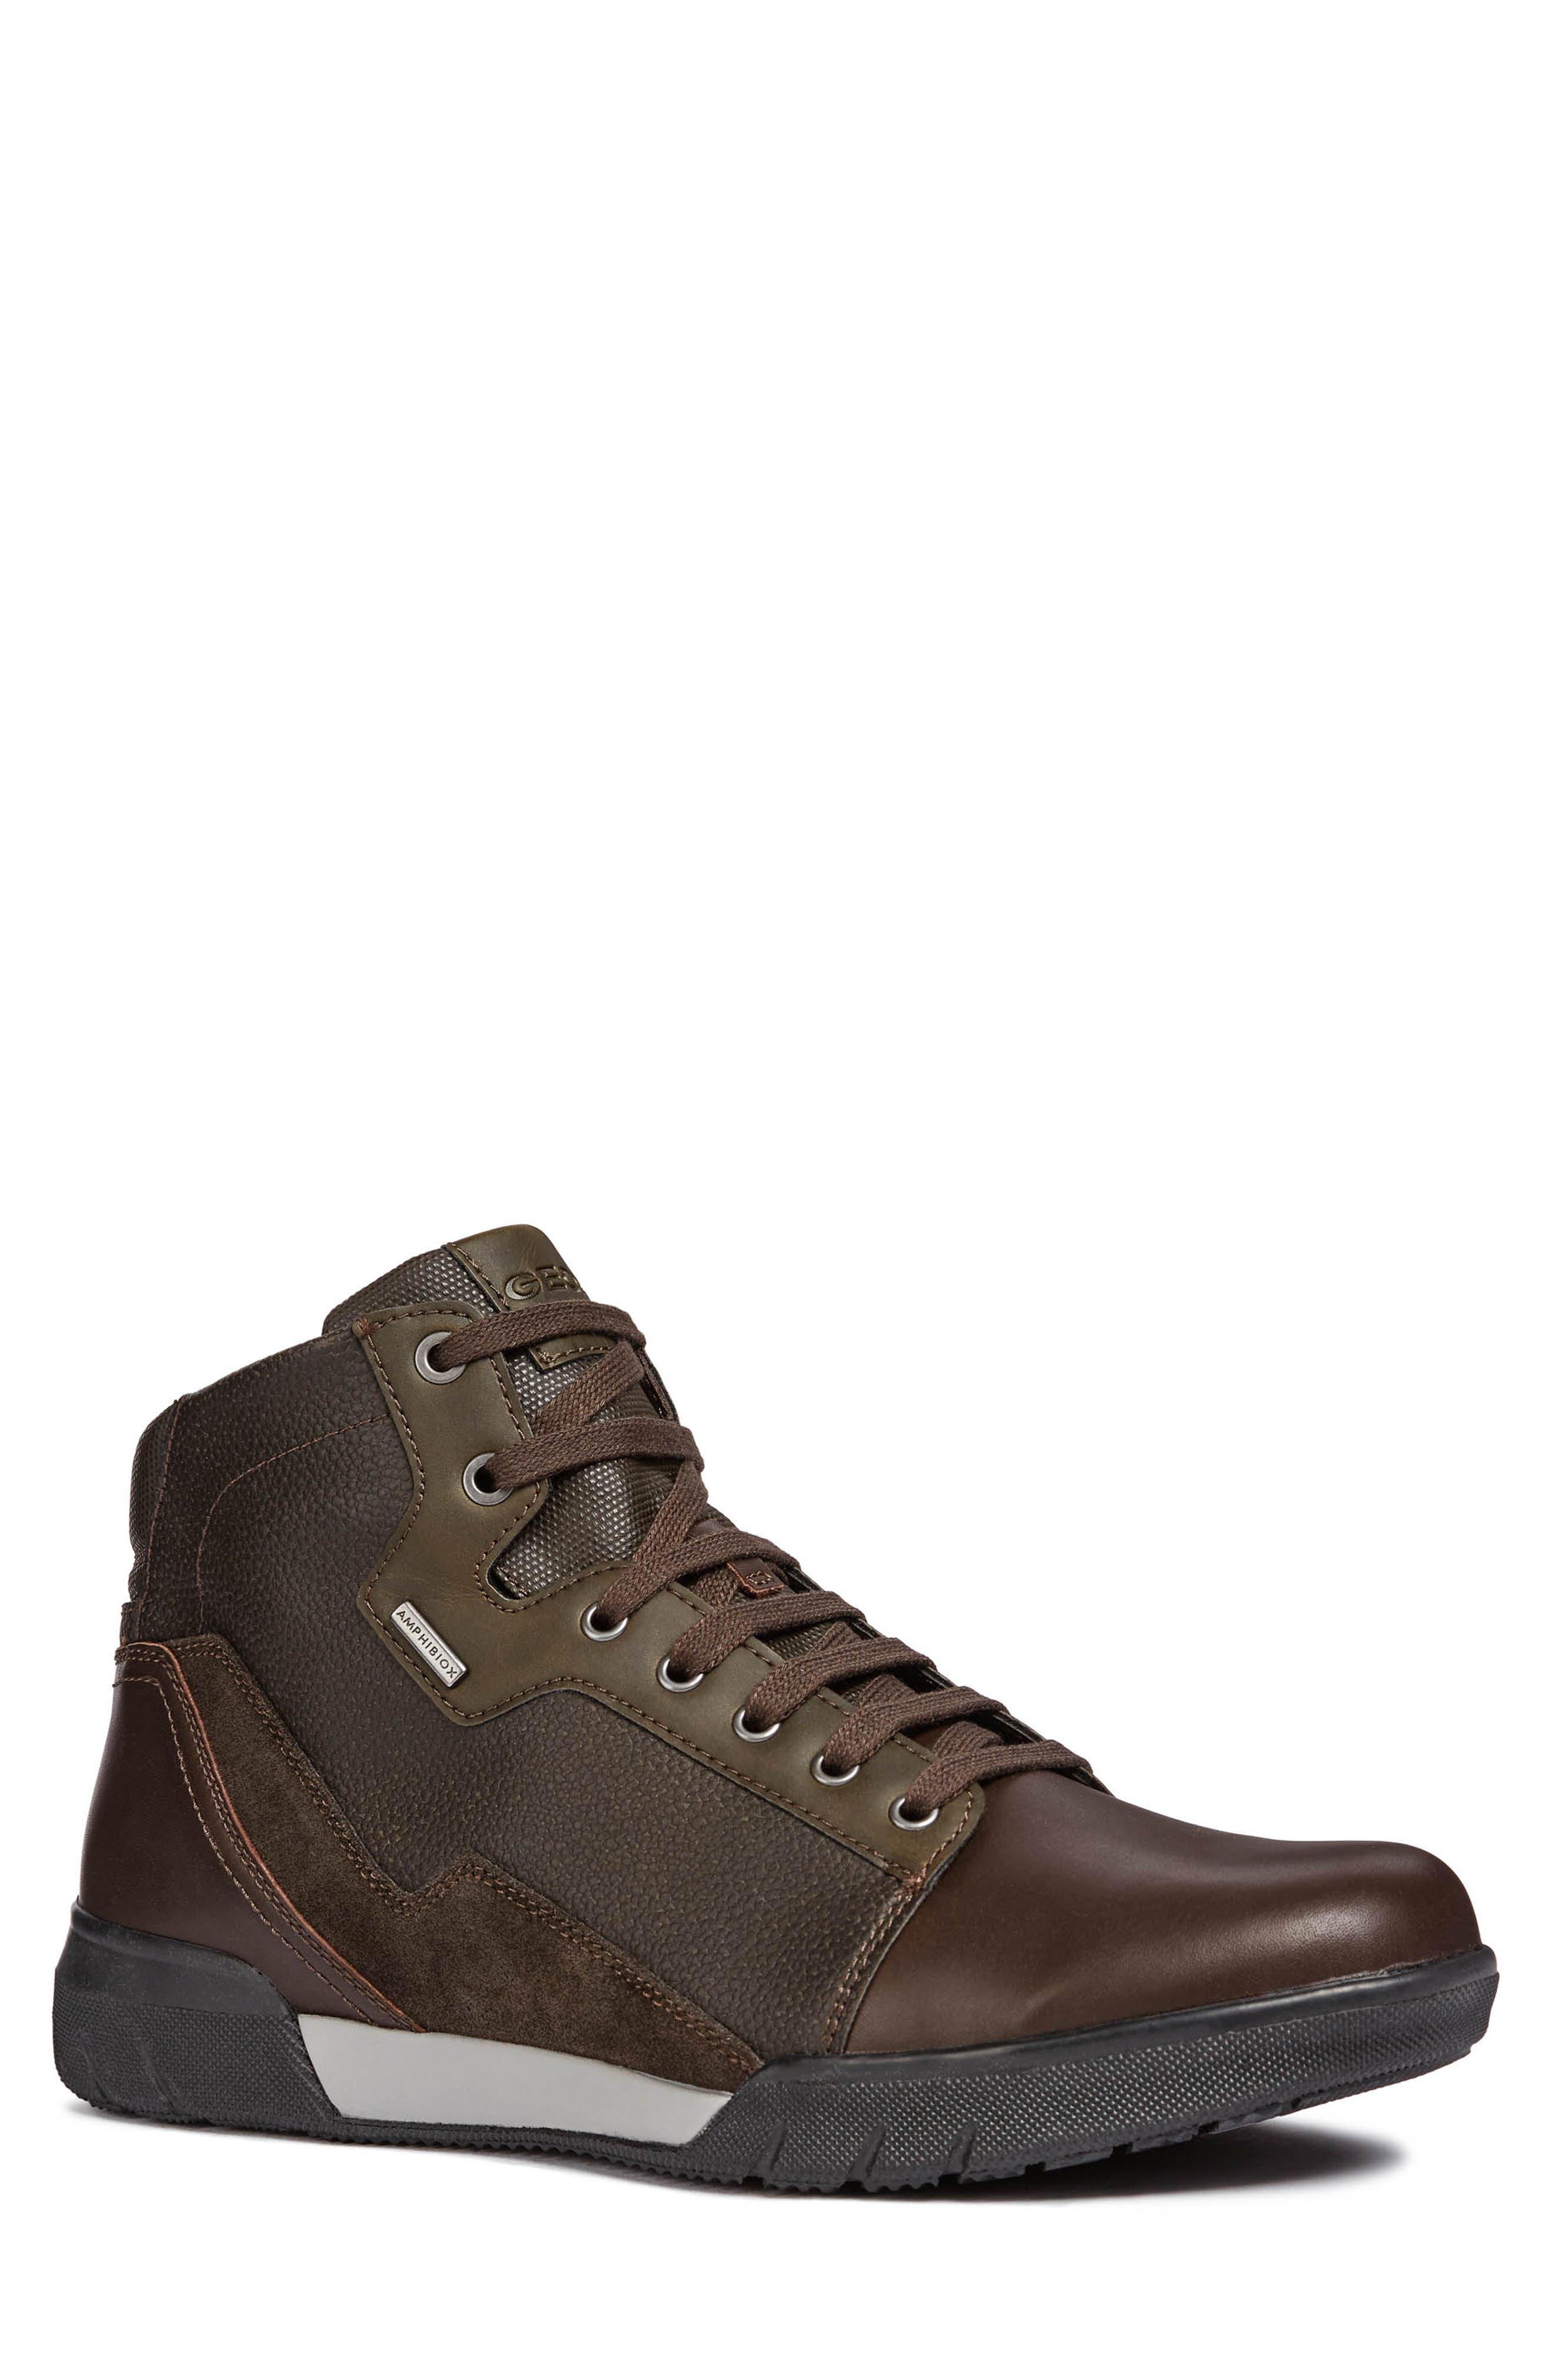 GEOX Redward Amphibiox Waterproof Boot in Dark Coffee